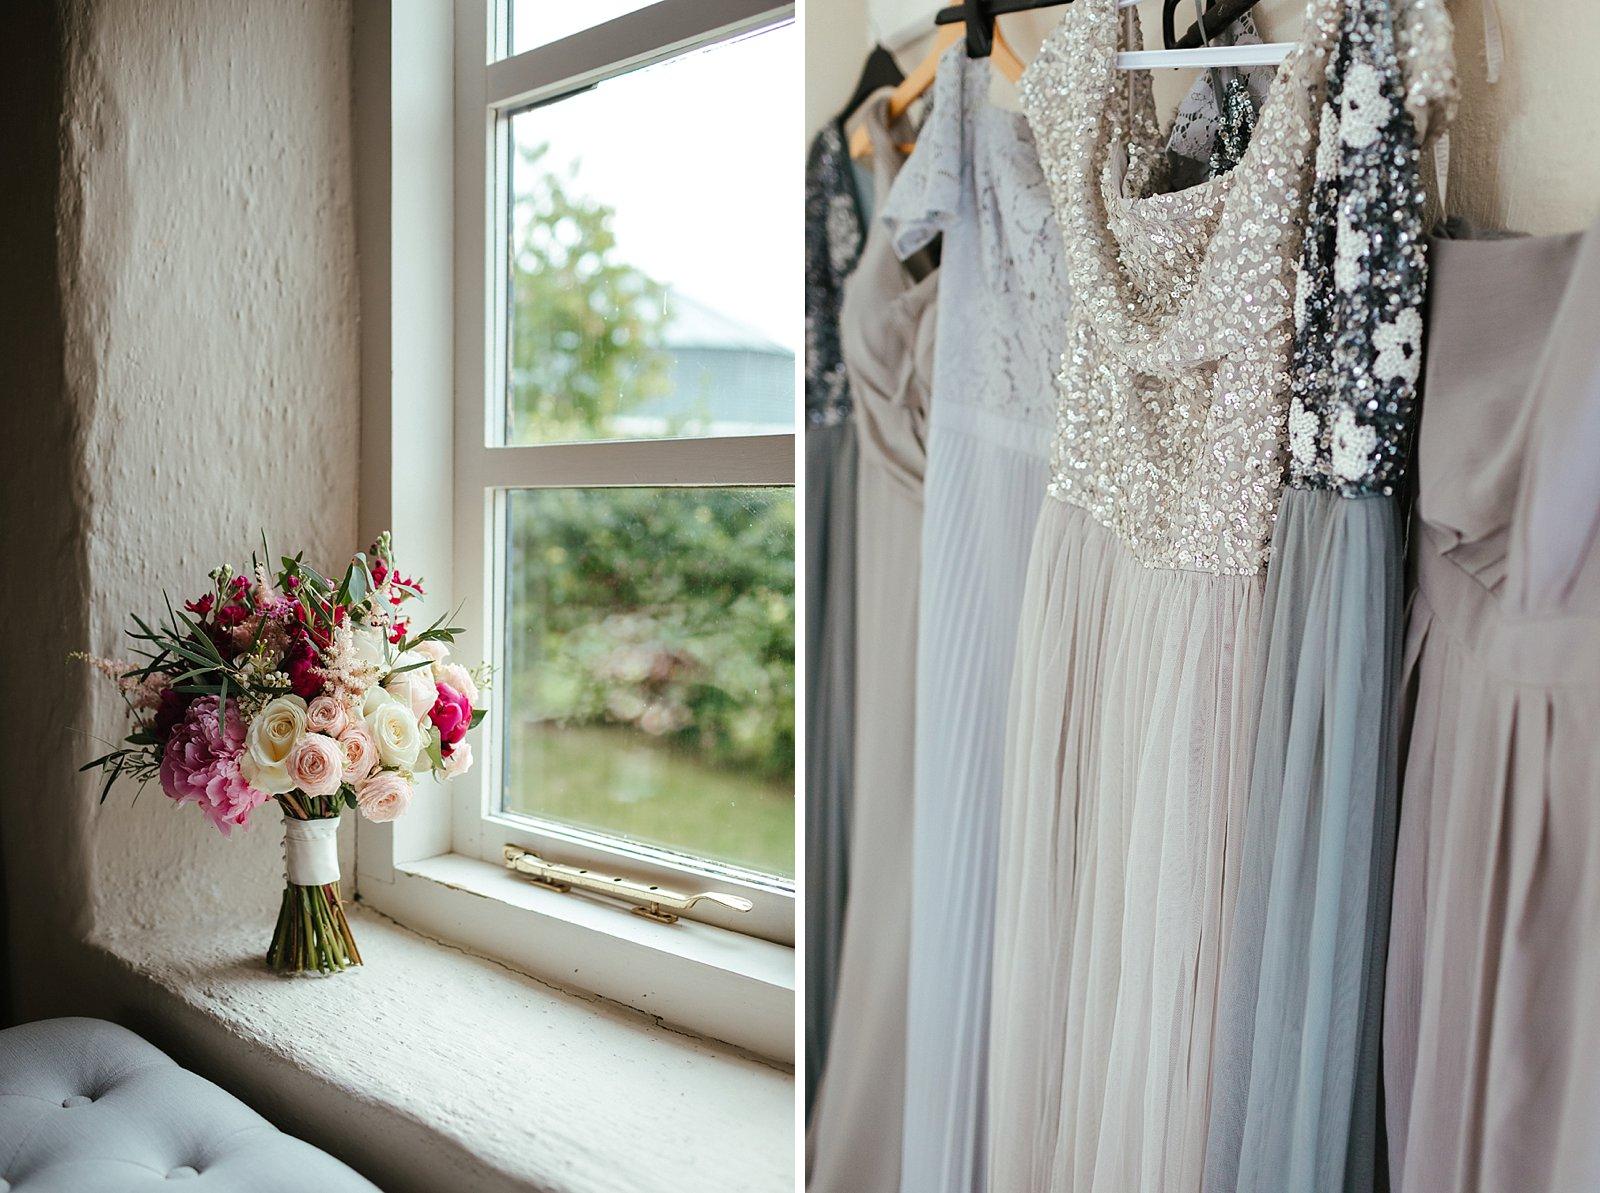 Full length grey bridesmaids dresses